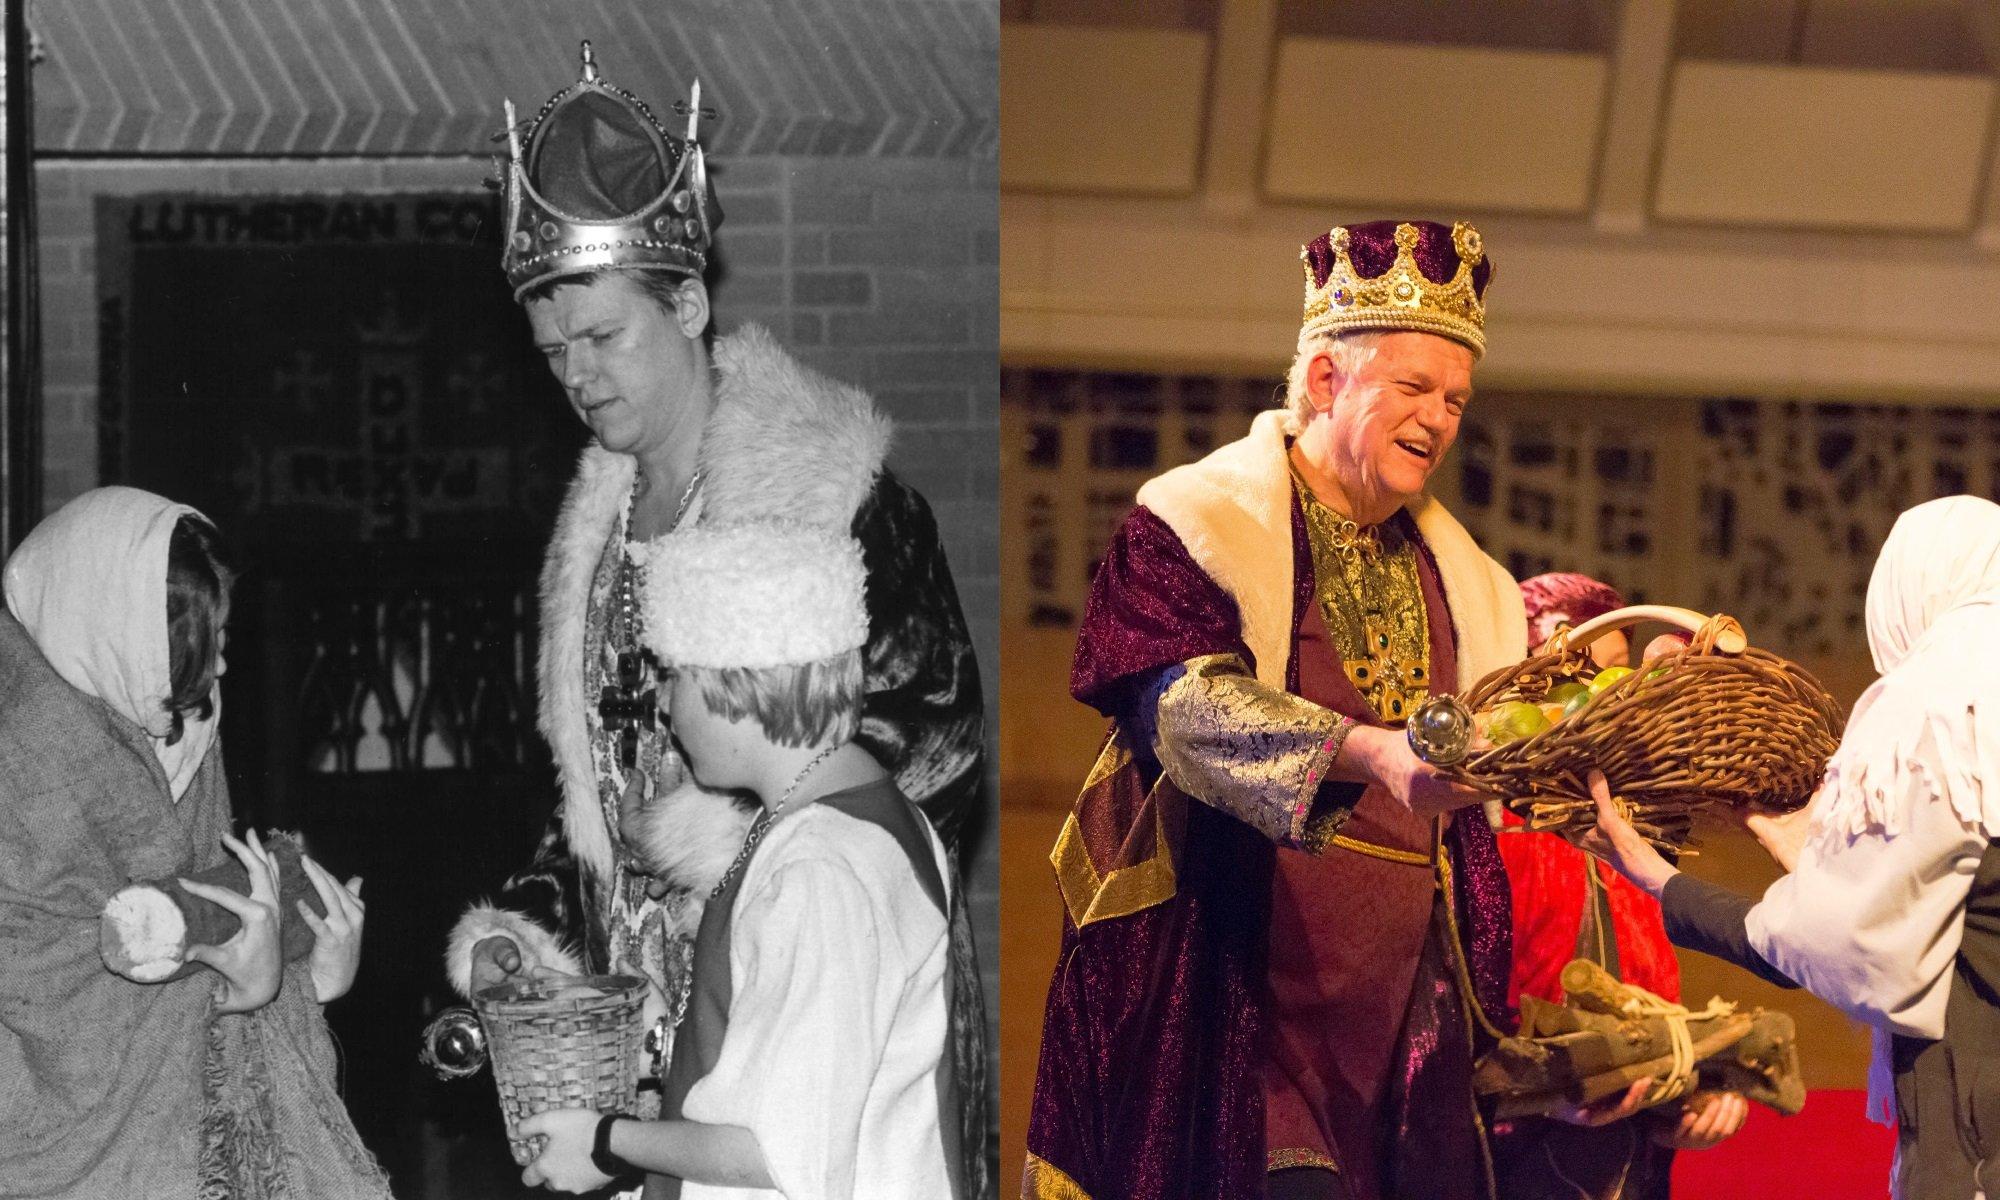 King Wenceslas through the years